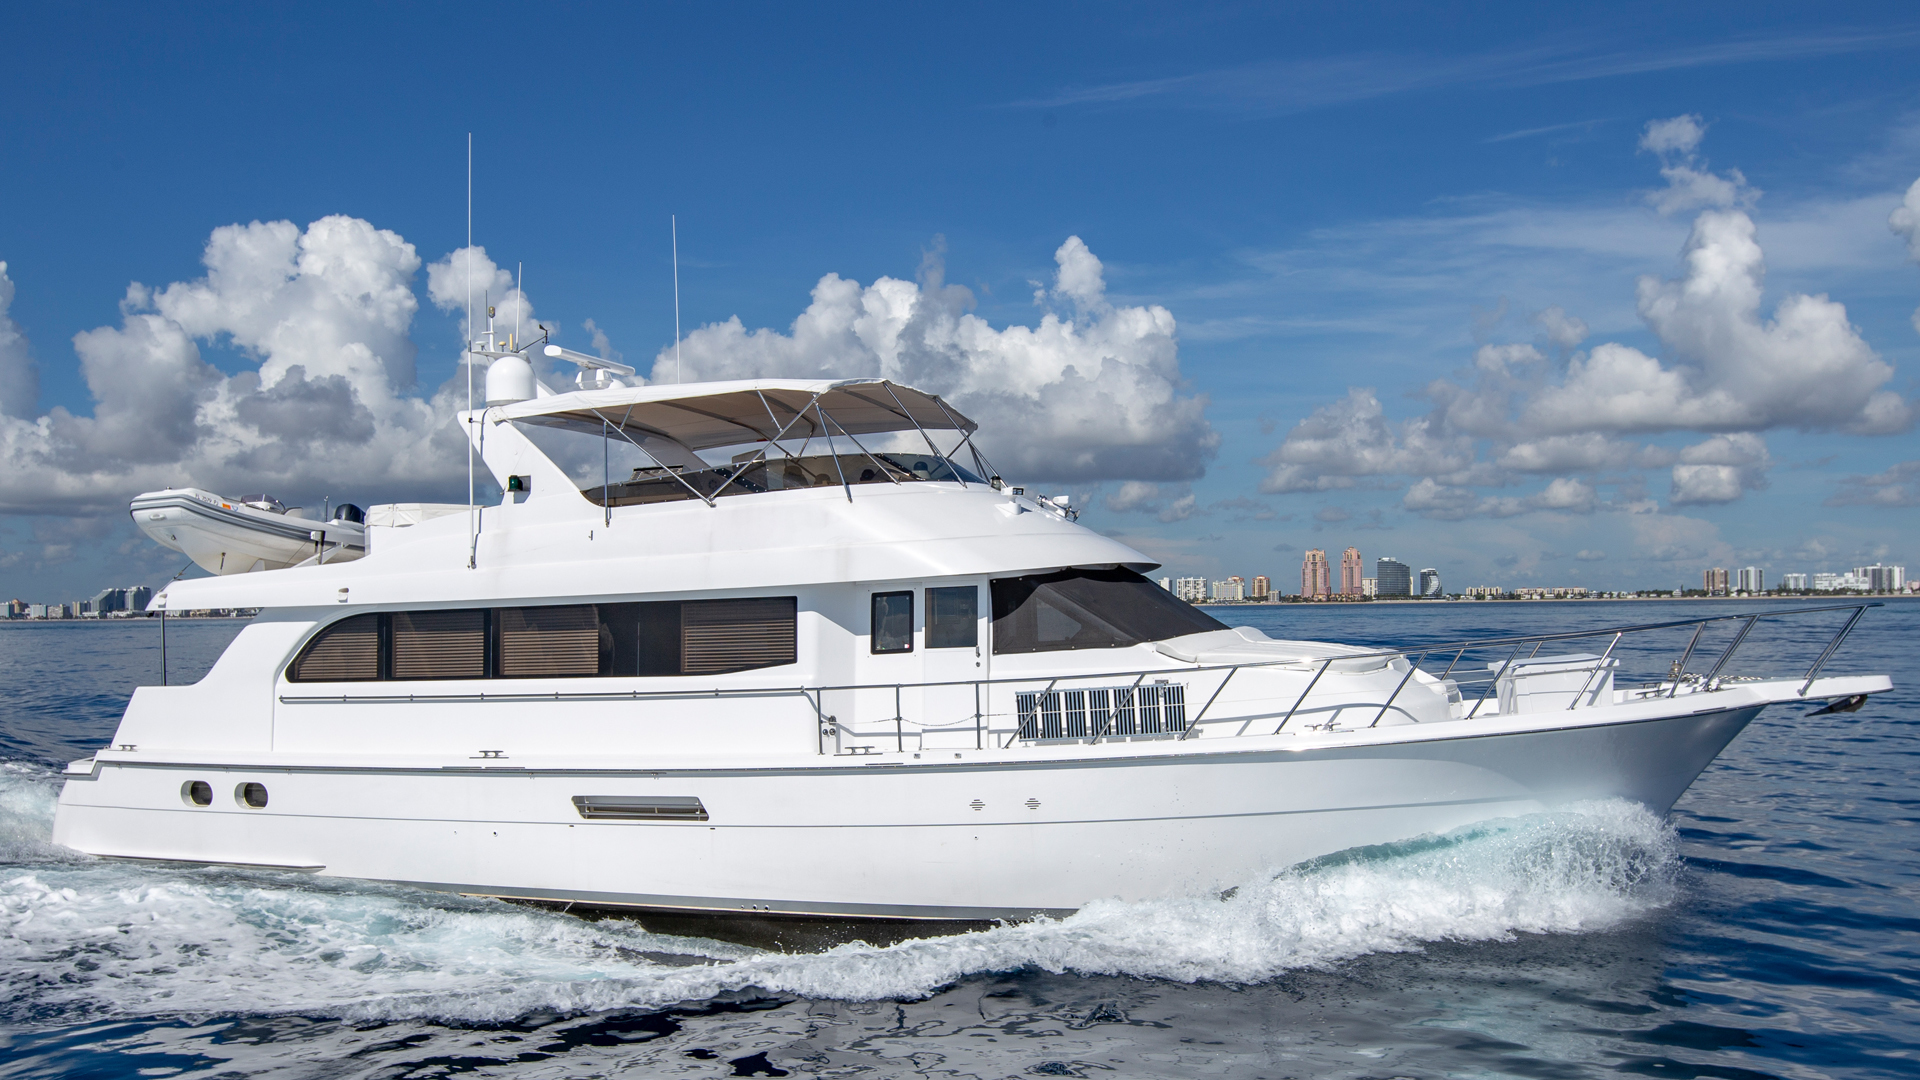 Hatteras-Cockpit Motor Yacht 2000-Getaway Ft. Lauderdale-Florida-United States-Profile-1417483 | Thumbnail